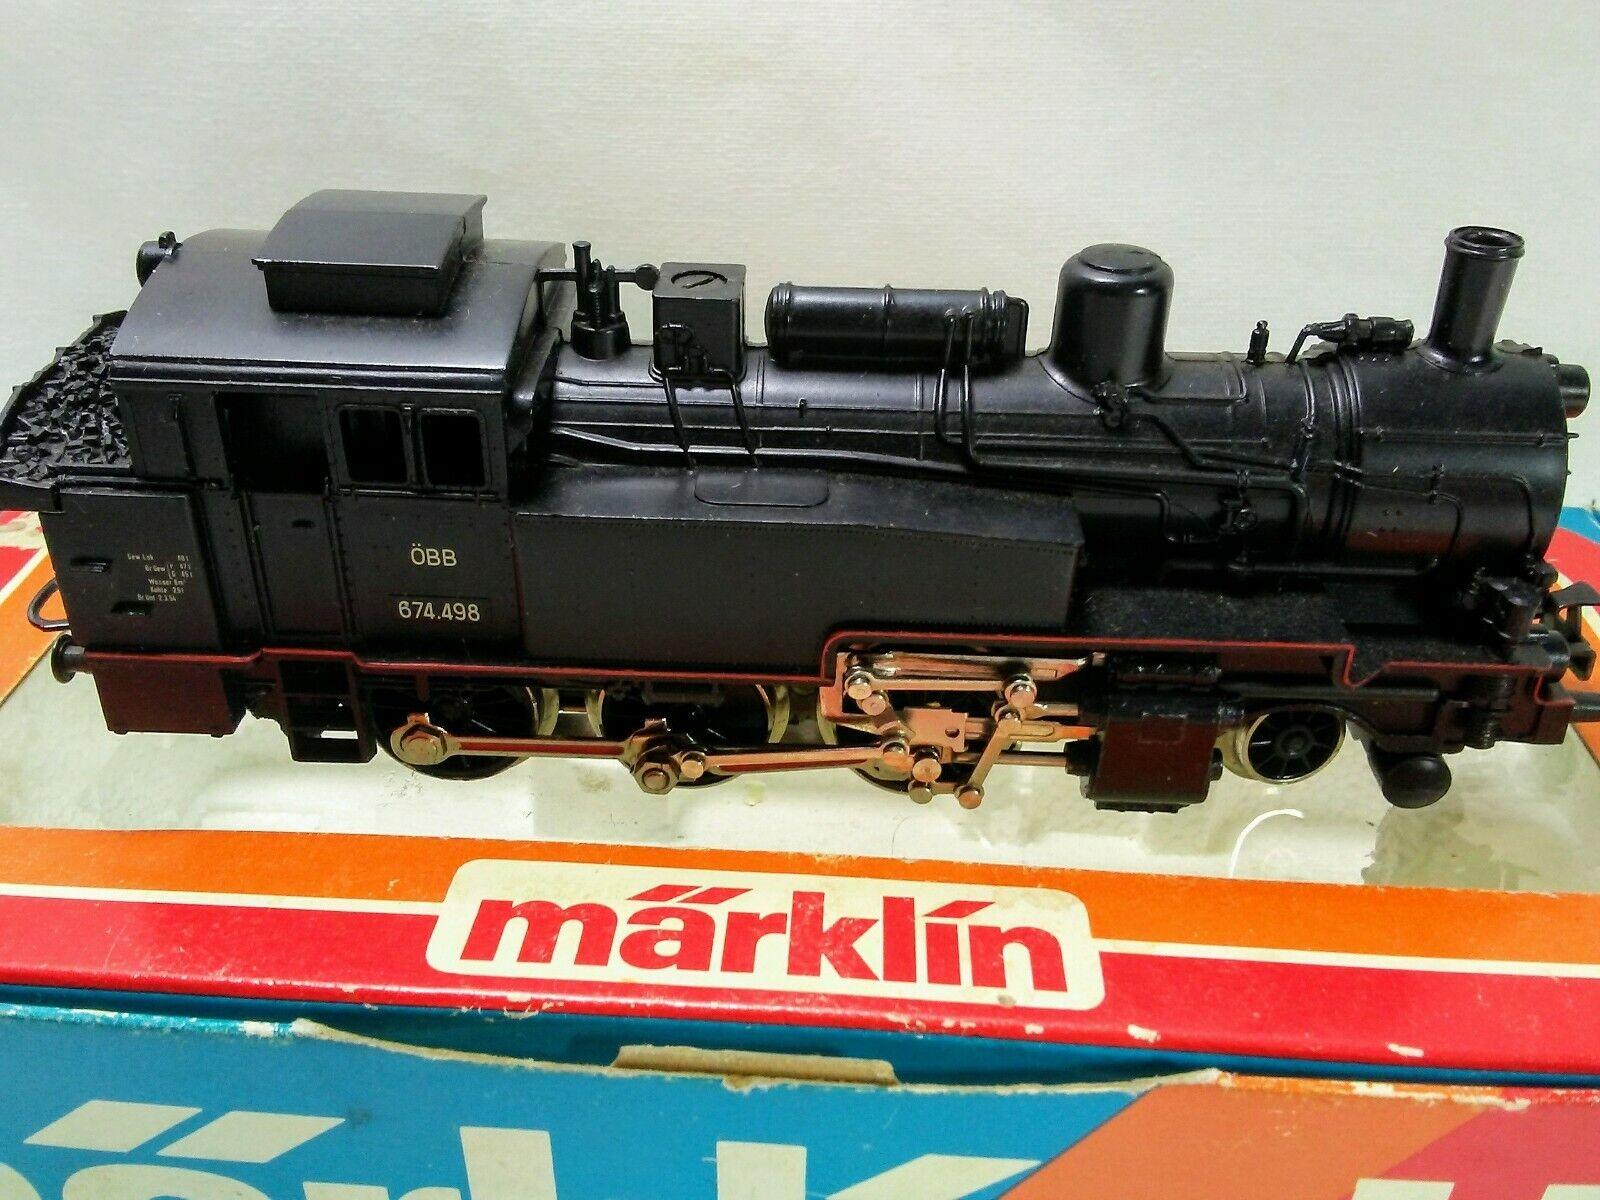 Marklin HO 3105 OBB Digital Ssquadra Engine Rare Austrian Locomotive